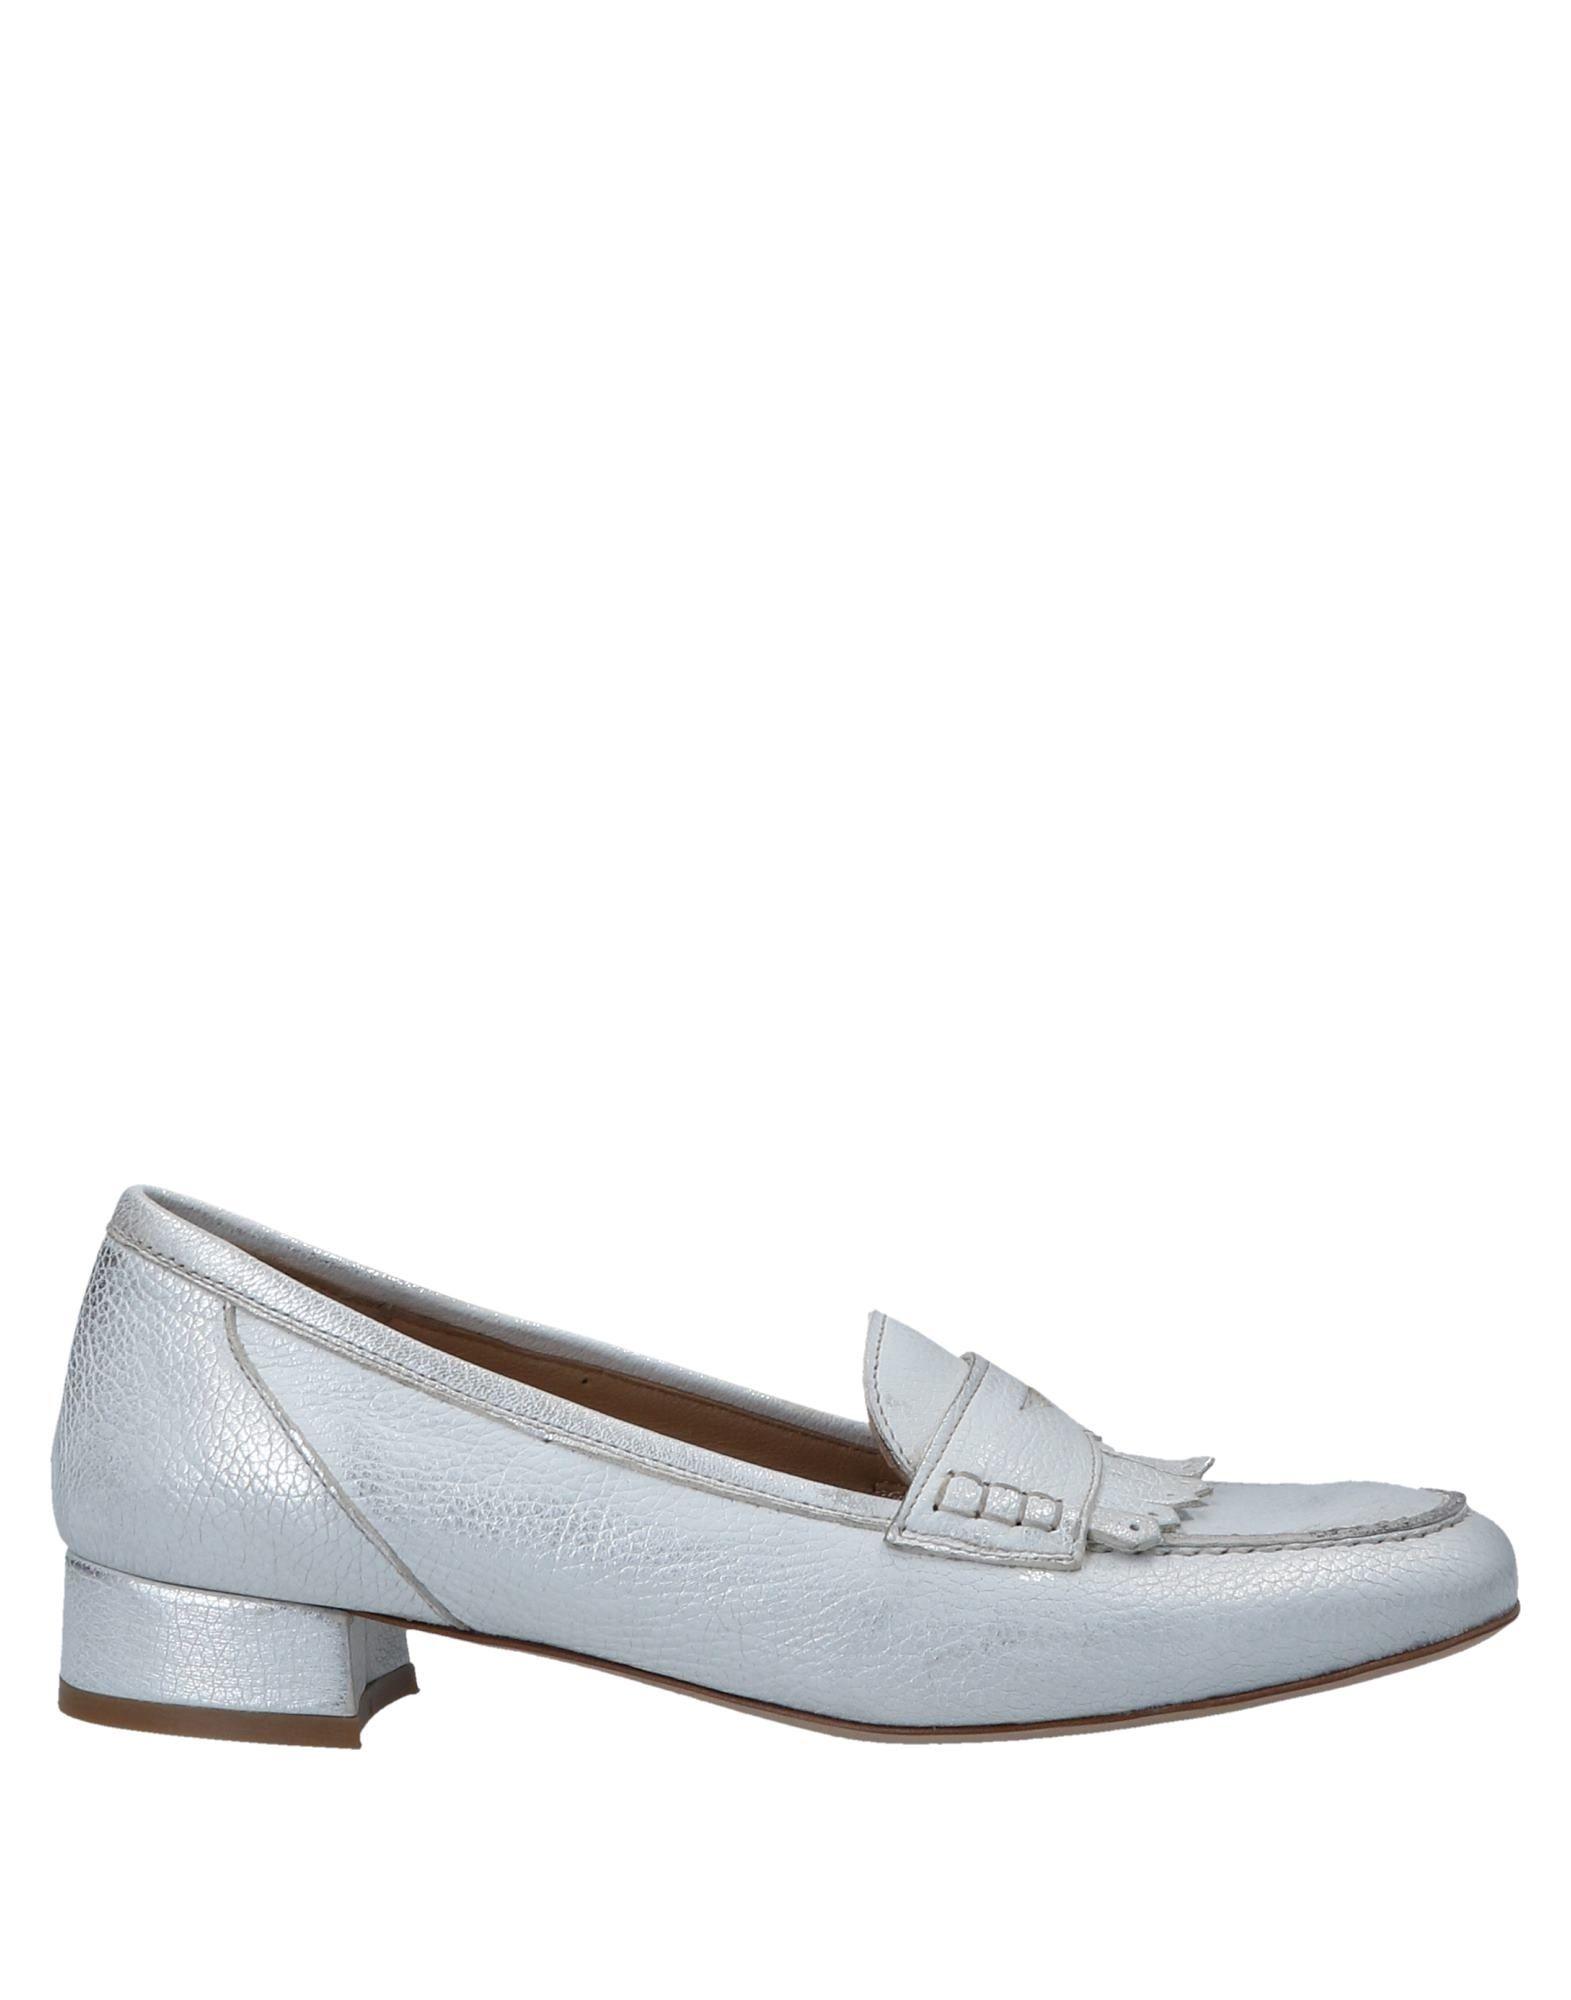 Infradito Tenhappytoes Donna e - 11530295JD Nuove offerte e Donna scarpe comode 04c671